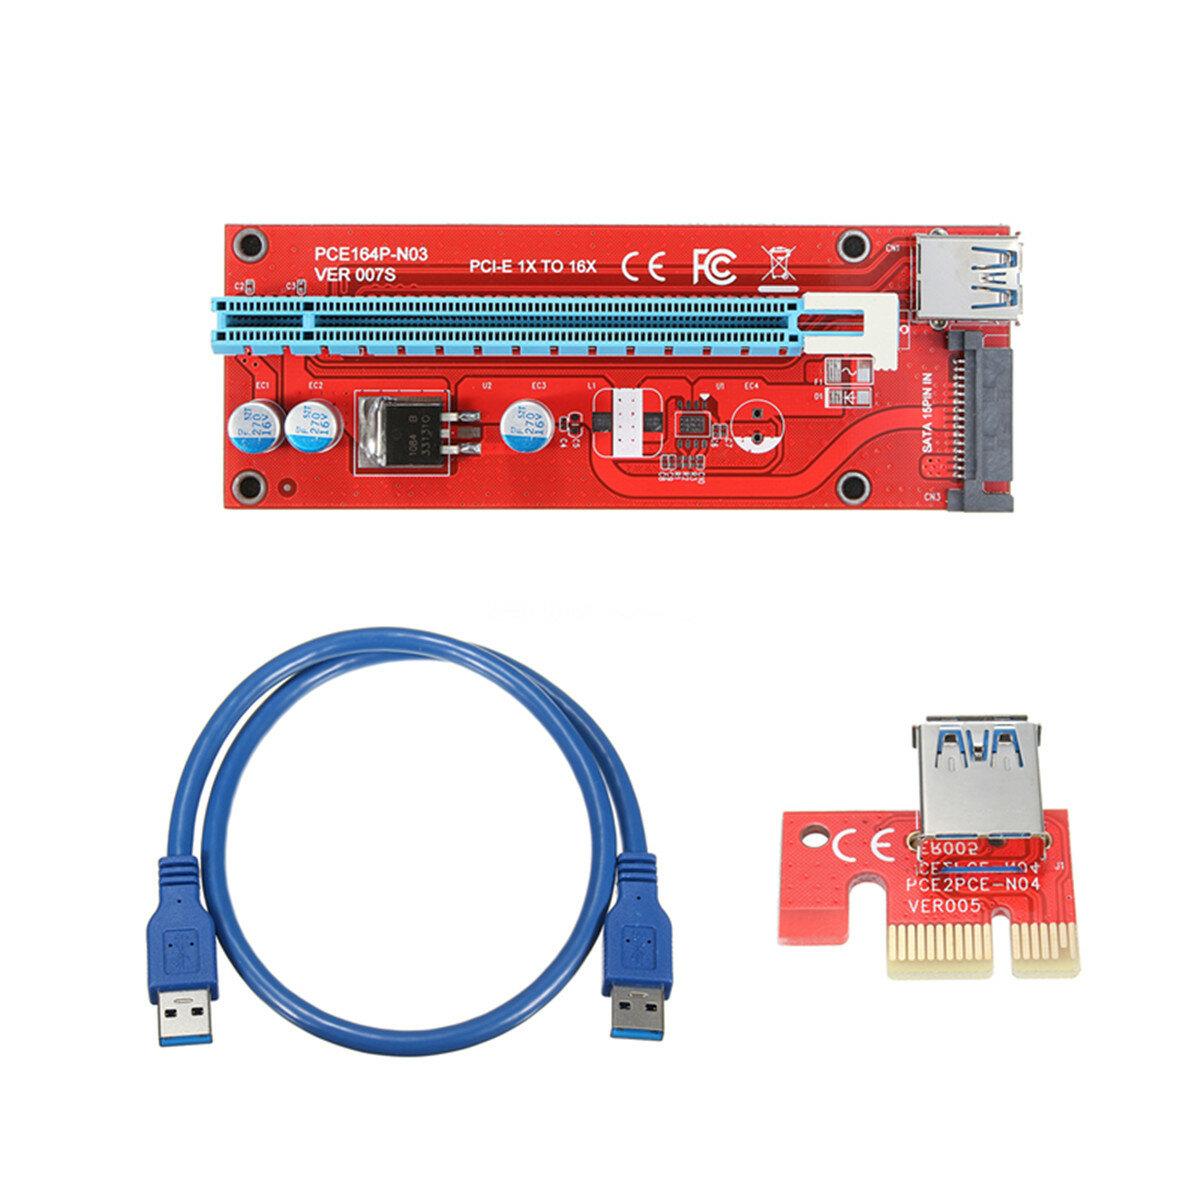 0.6m USB 3.0 PCI-E Express 1x to16x удлинительный кабель удлинитель Riser Board Card Adapter Cable